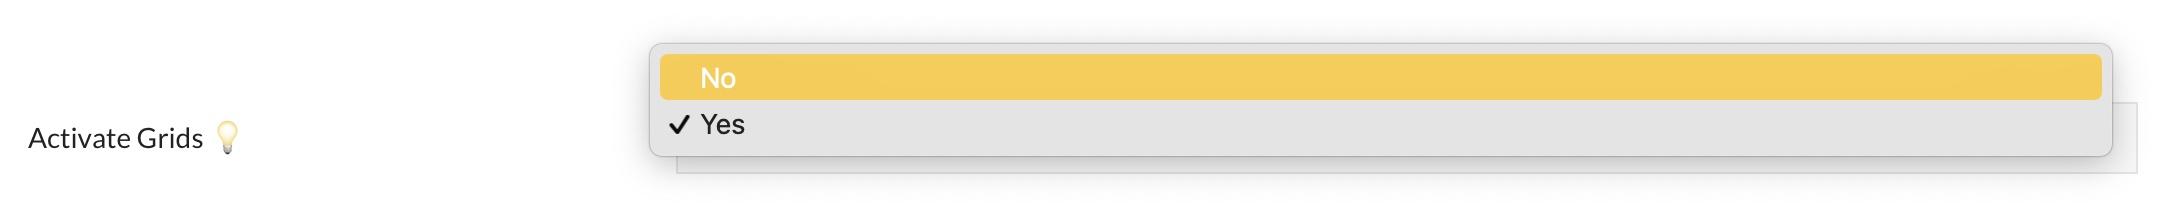 pooldues settings top bar activate grid